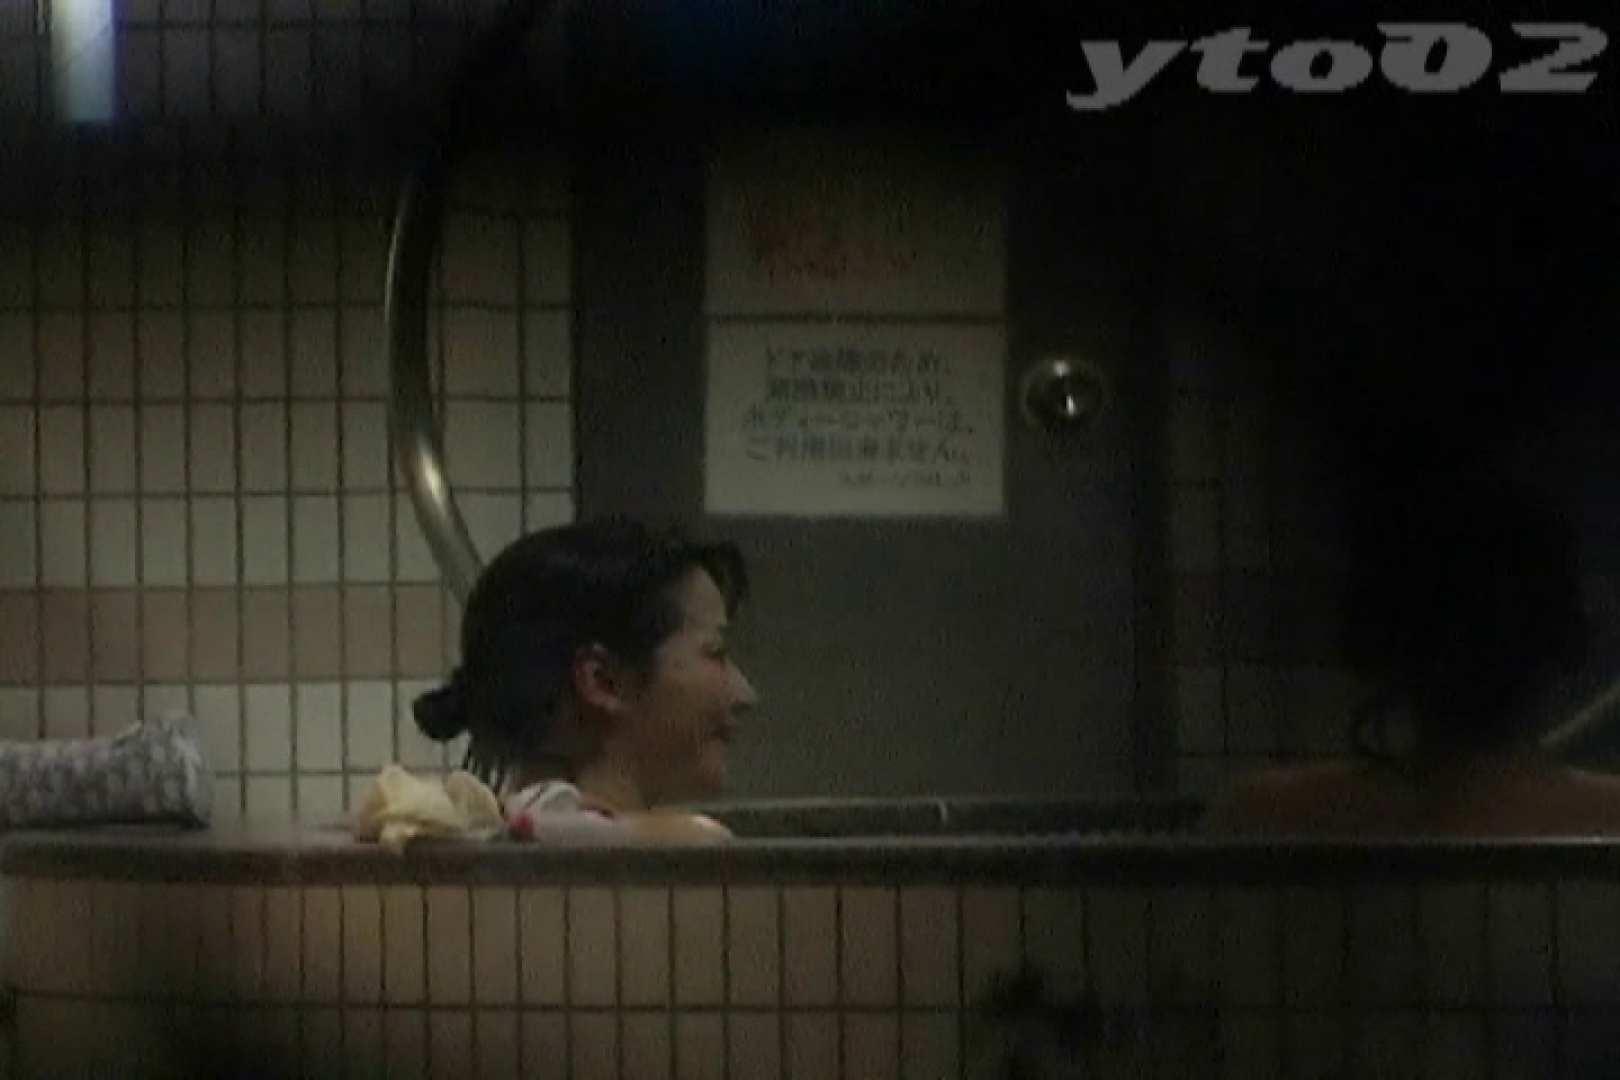 【期間限定配信】合宿ホテル女風呂盗撮 Vol.15 露天丸見え  106画像 32